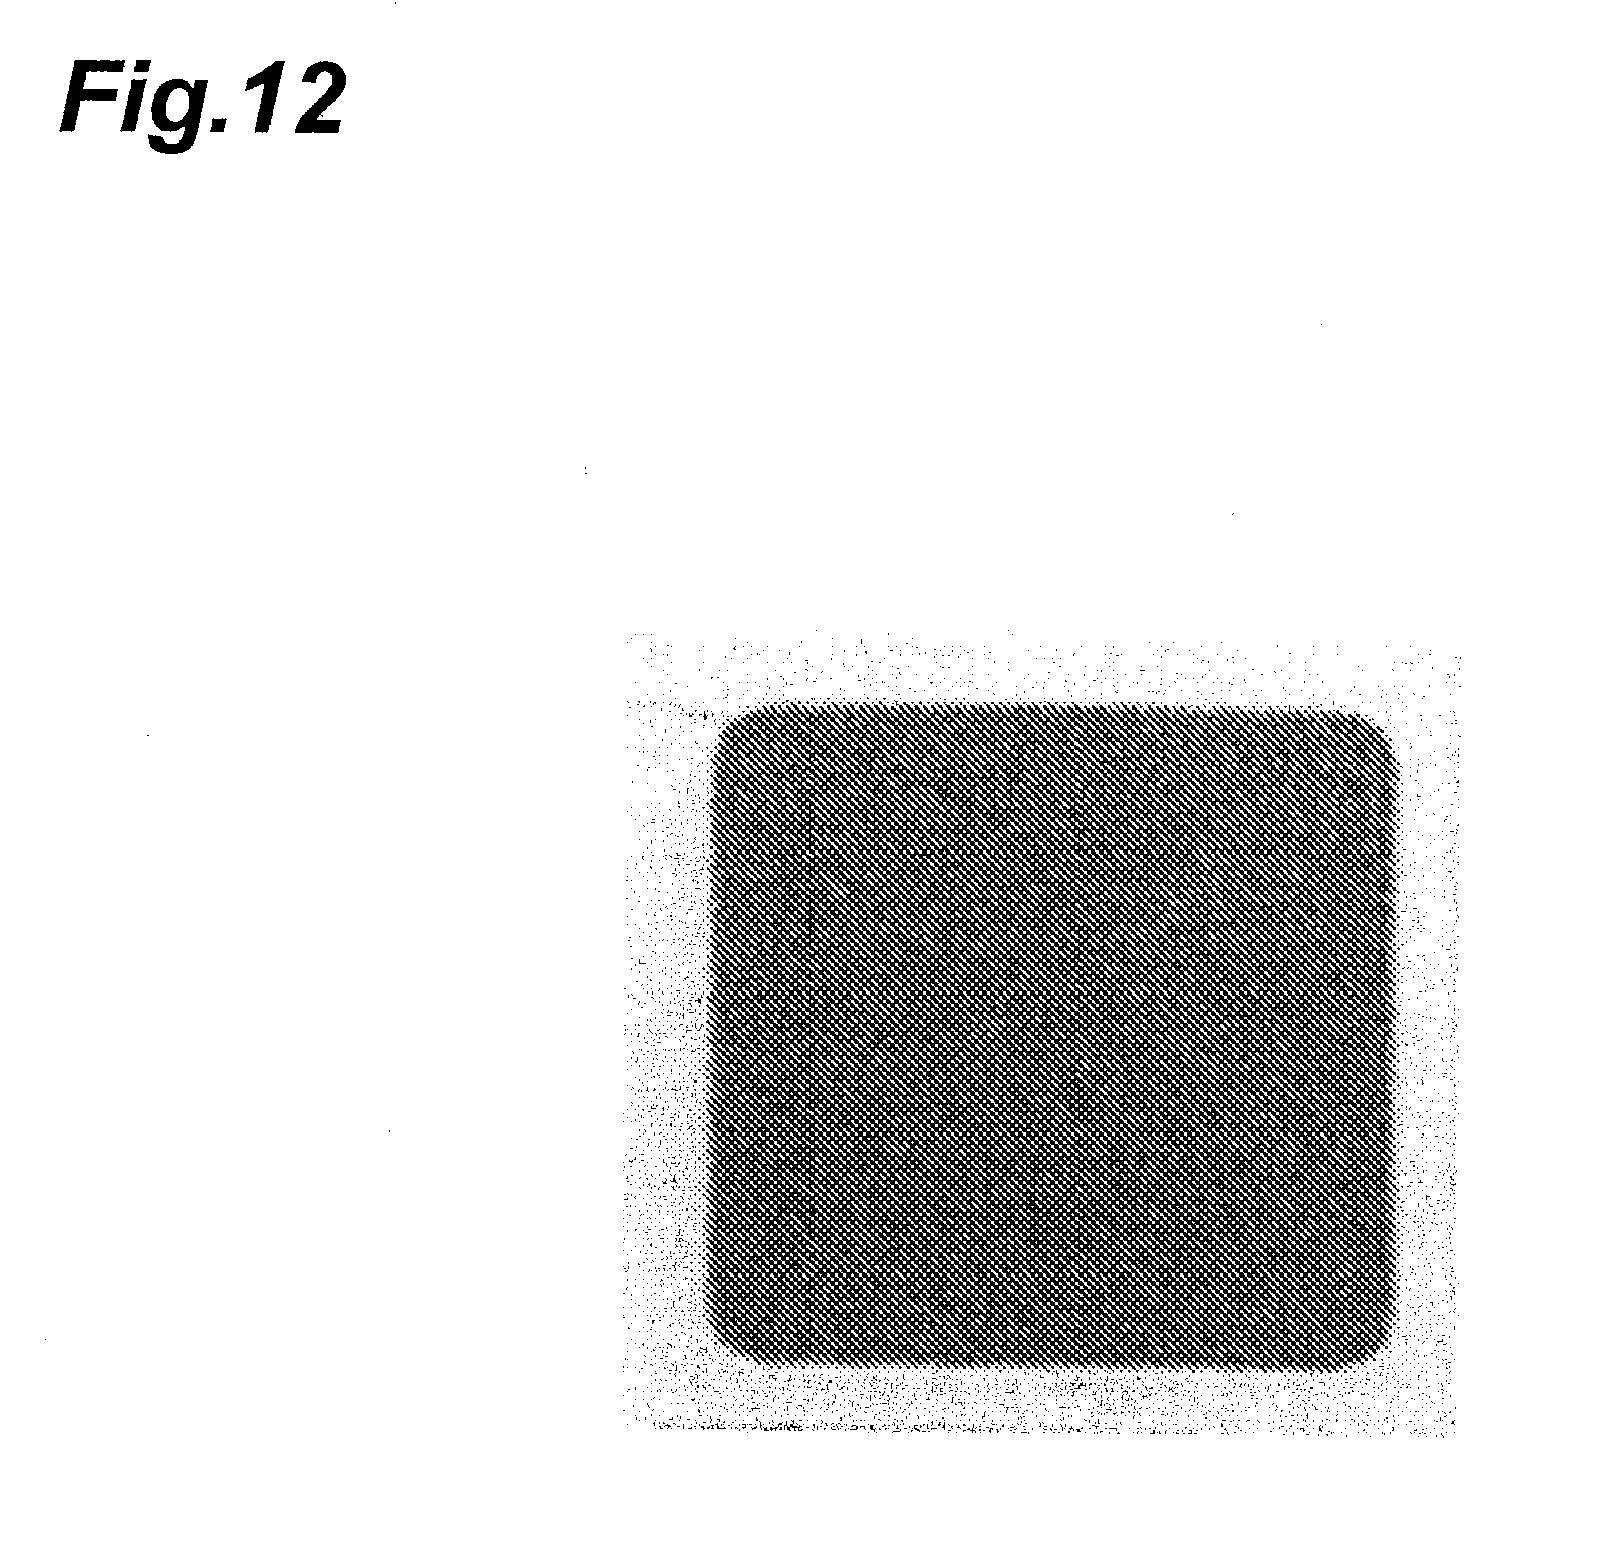 patent ep2255809a1 mit arzneistoff versetztes pflaster google patentsuche. Black Bedroom Furniture Sets. Home Design Ideas